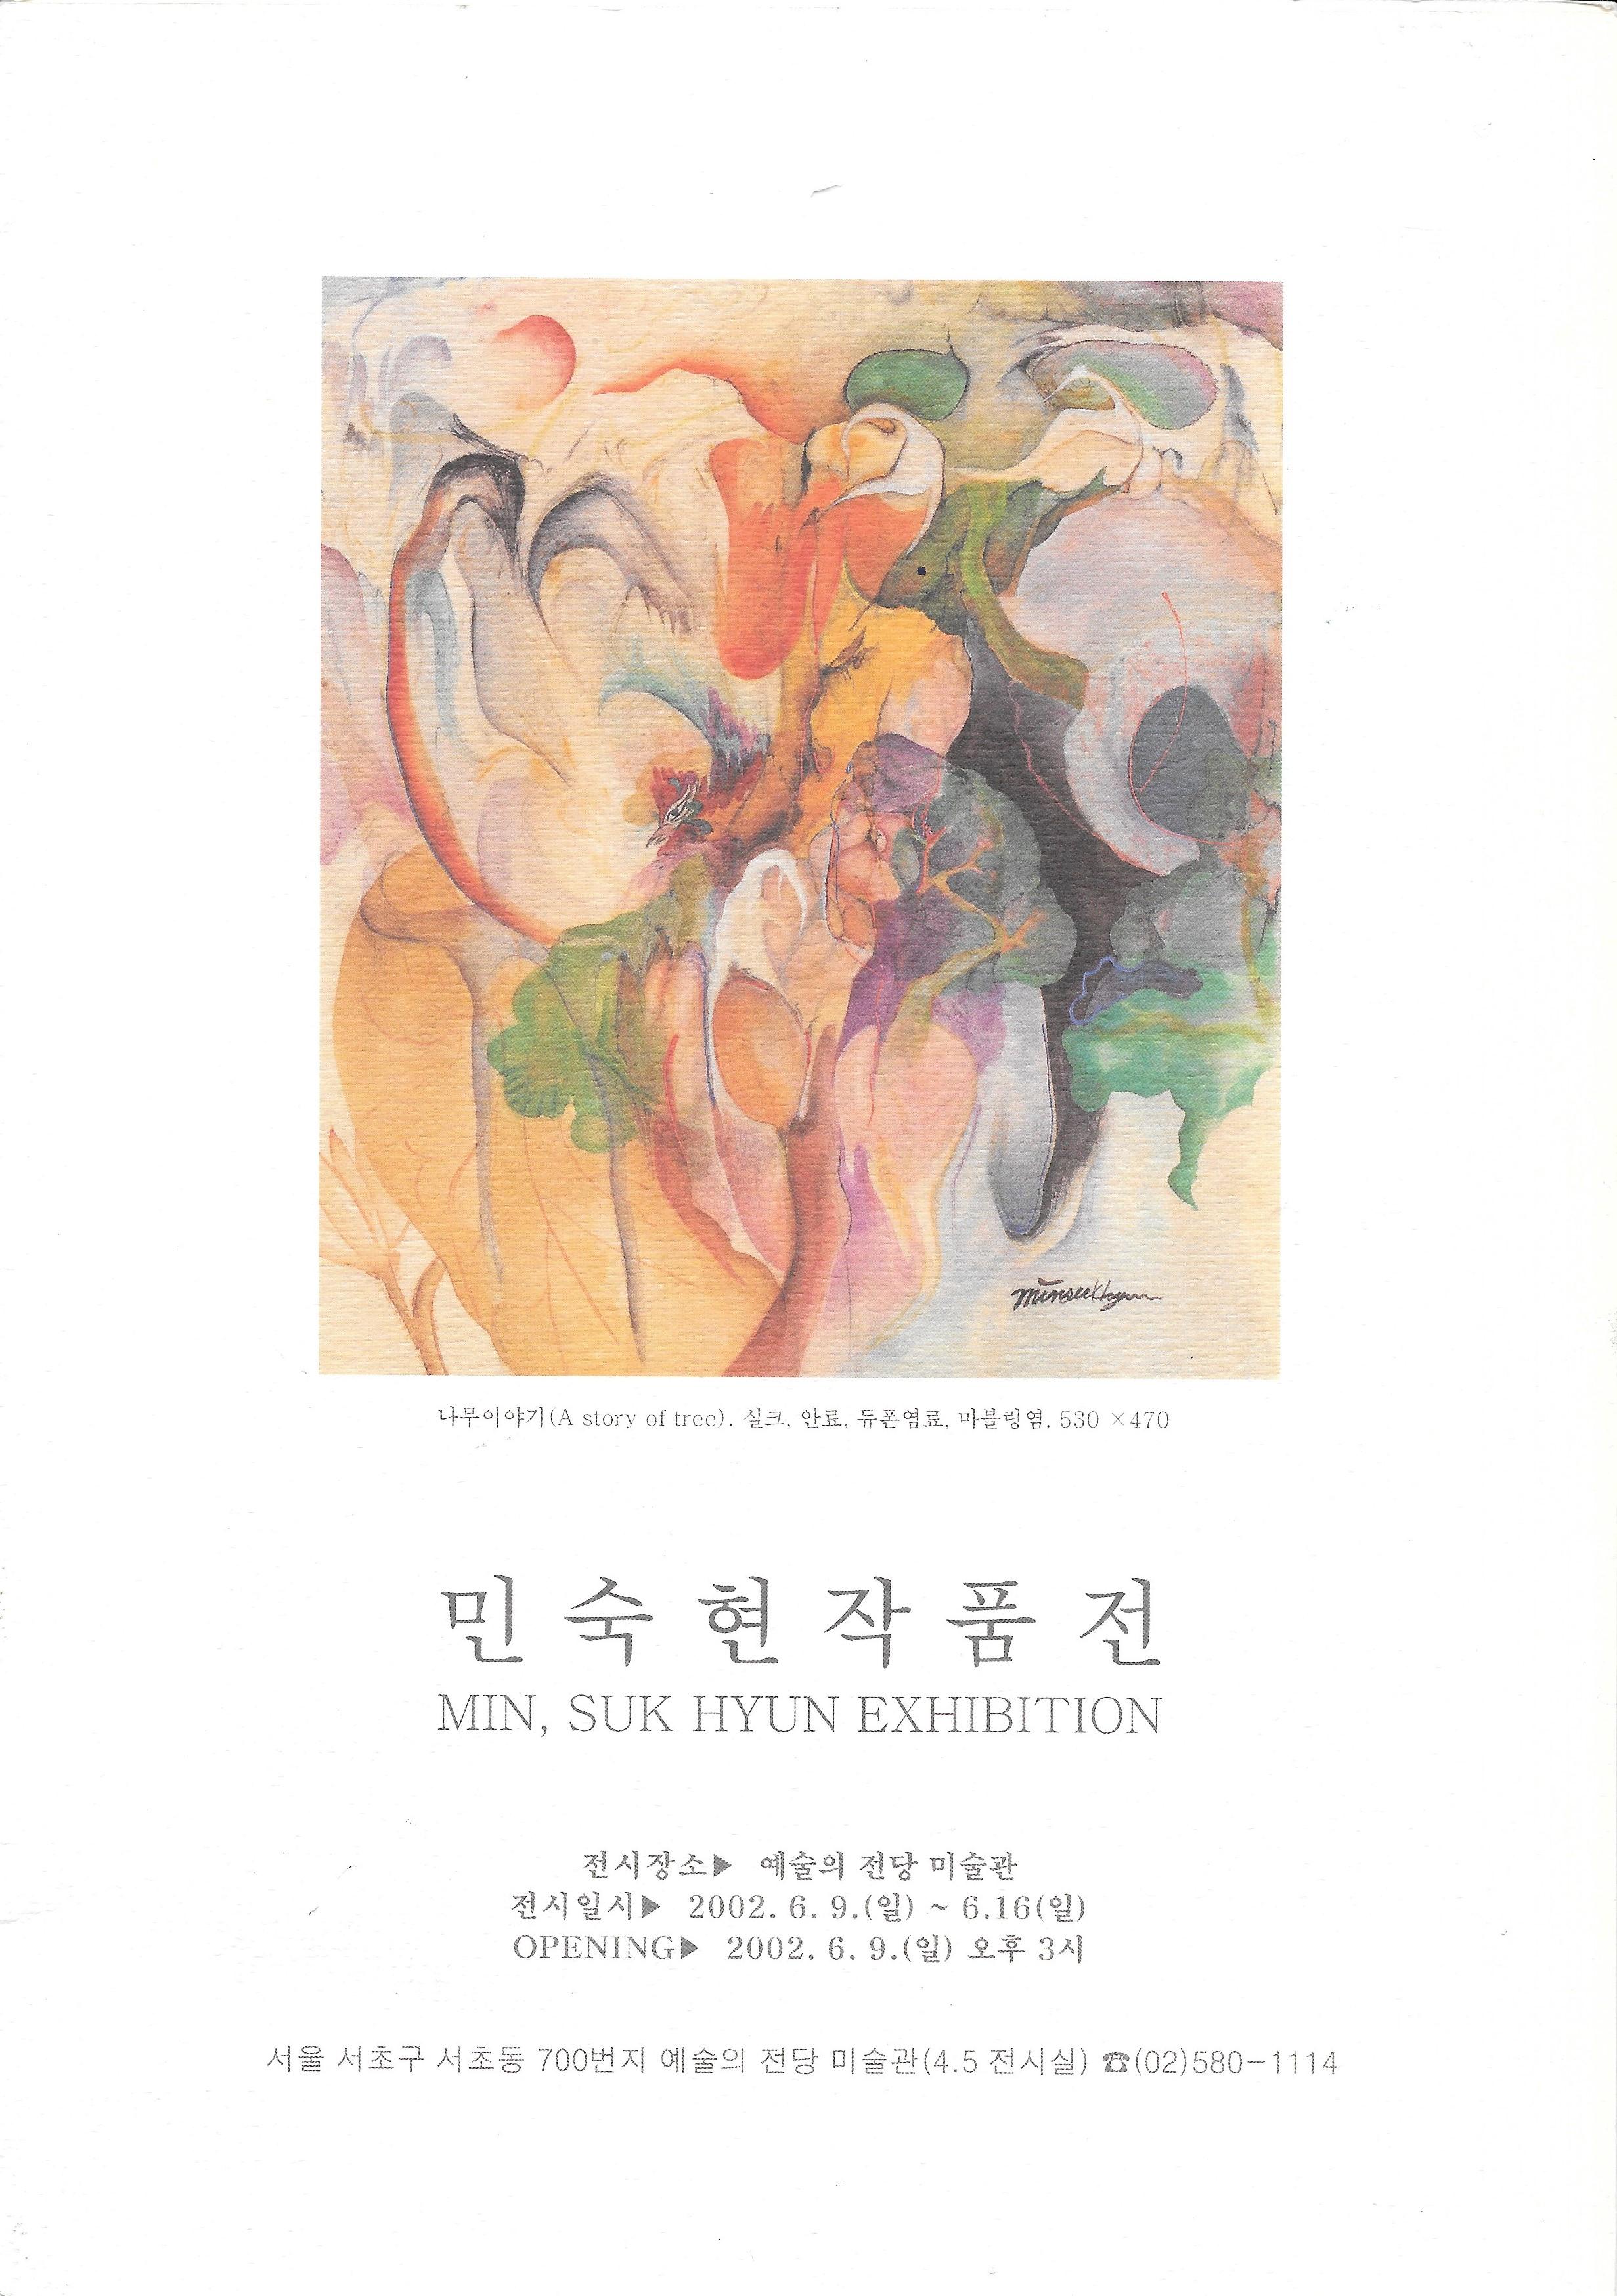 2002. Min sukhyun Exhibition